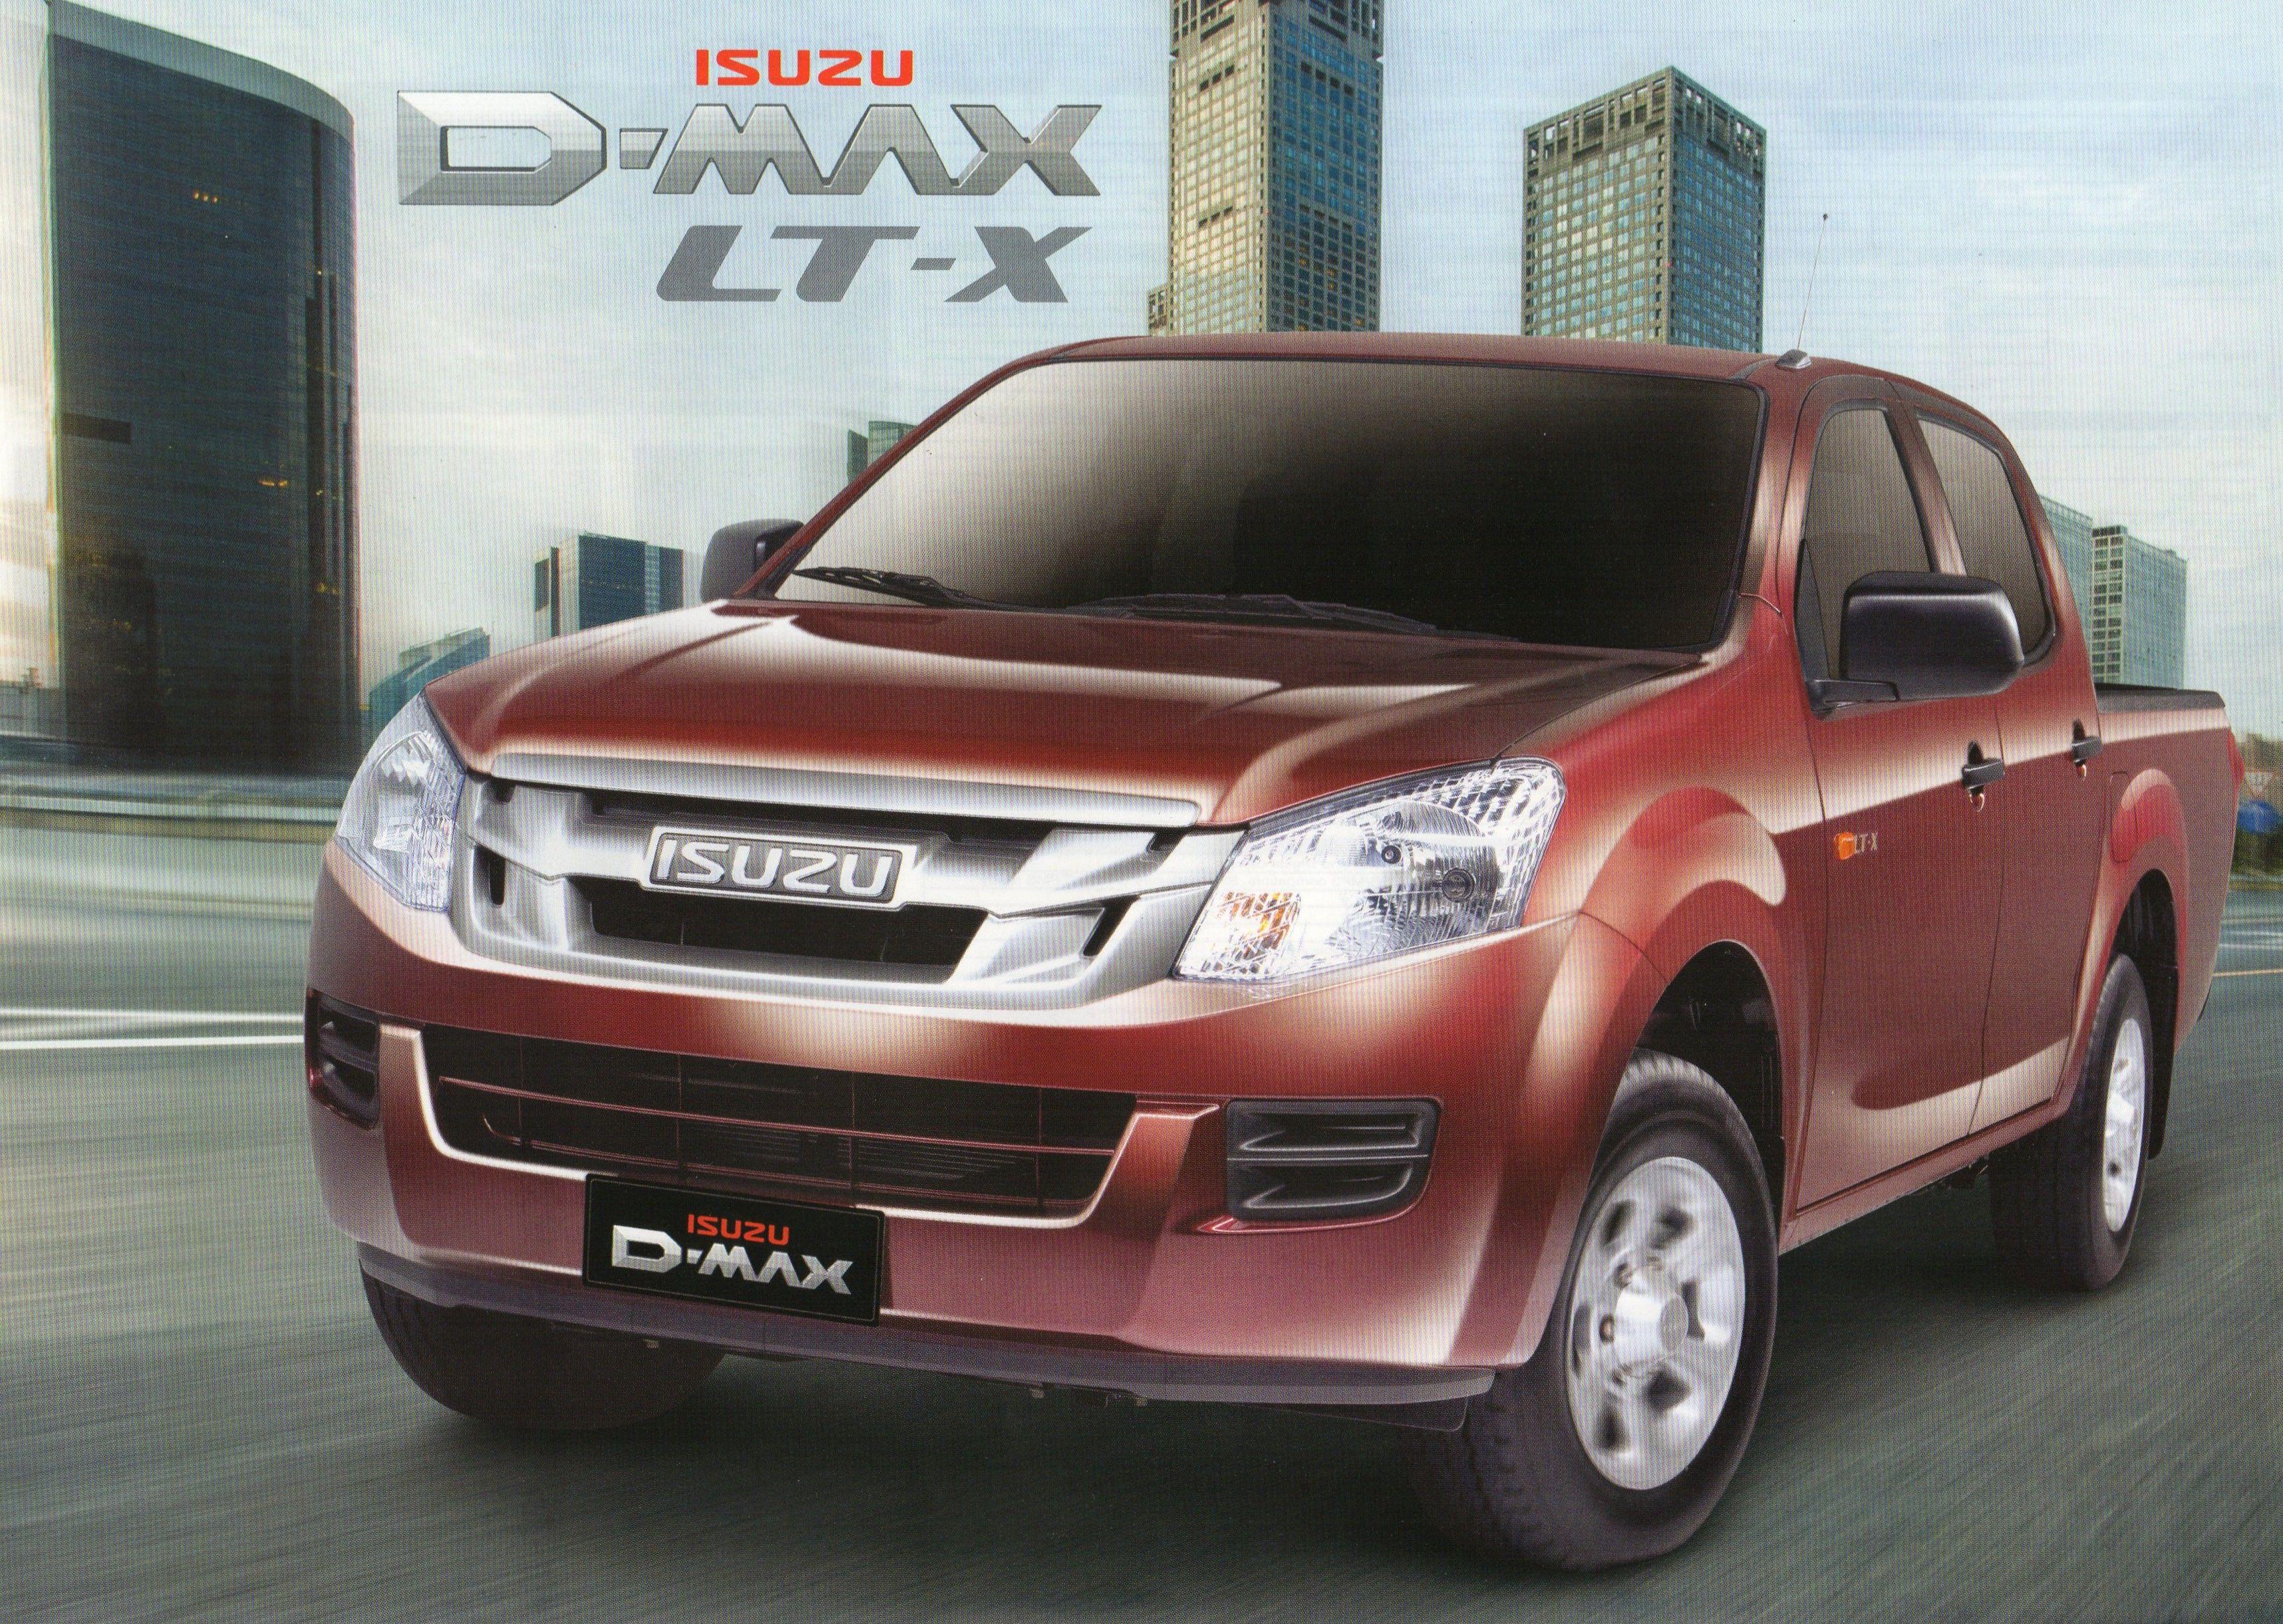 2015 isuzu d max lt x auto search philippines 2015 auto search philippineshtmlcars